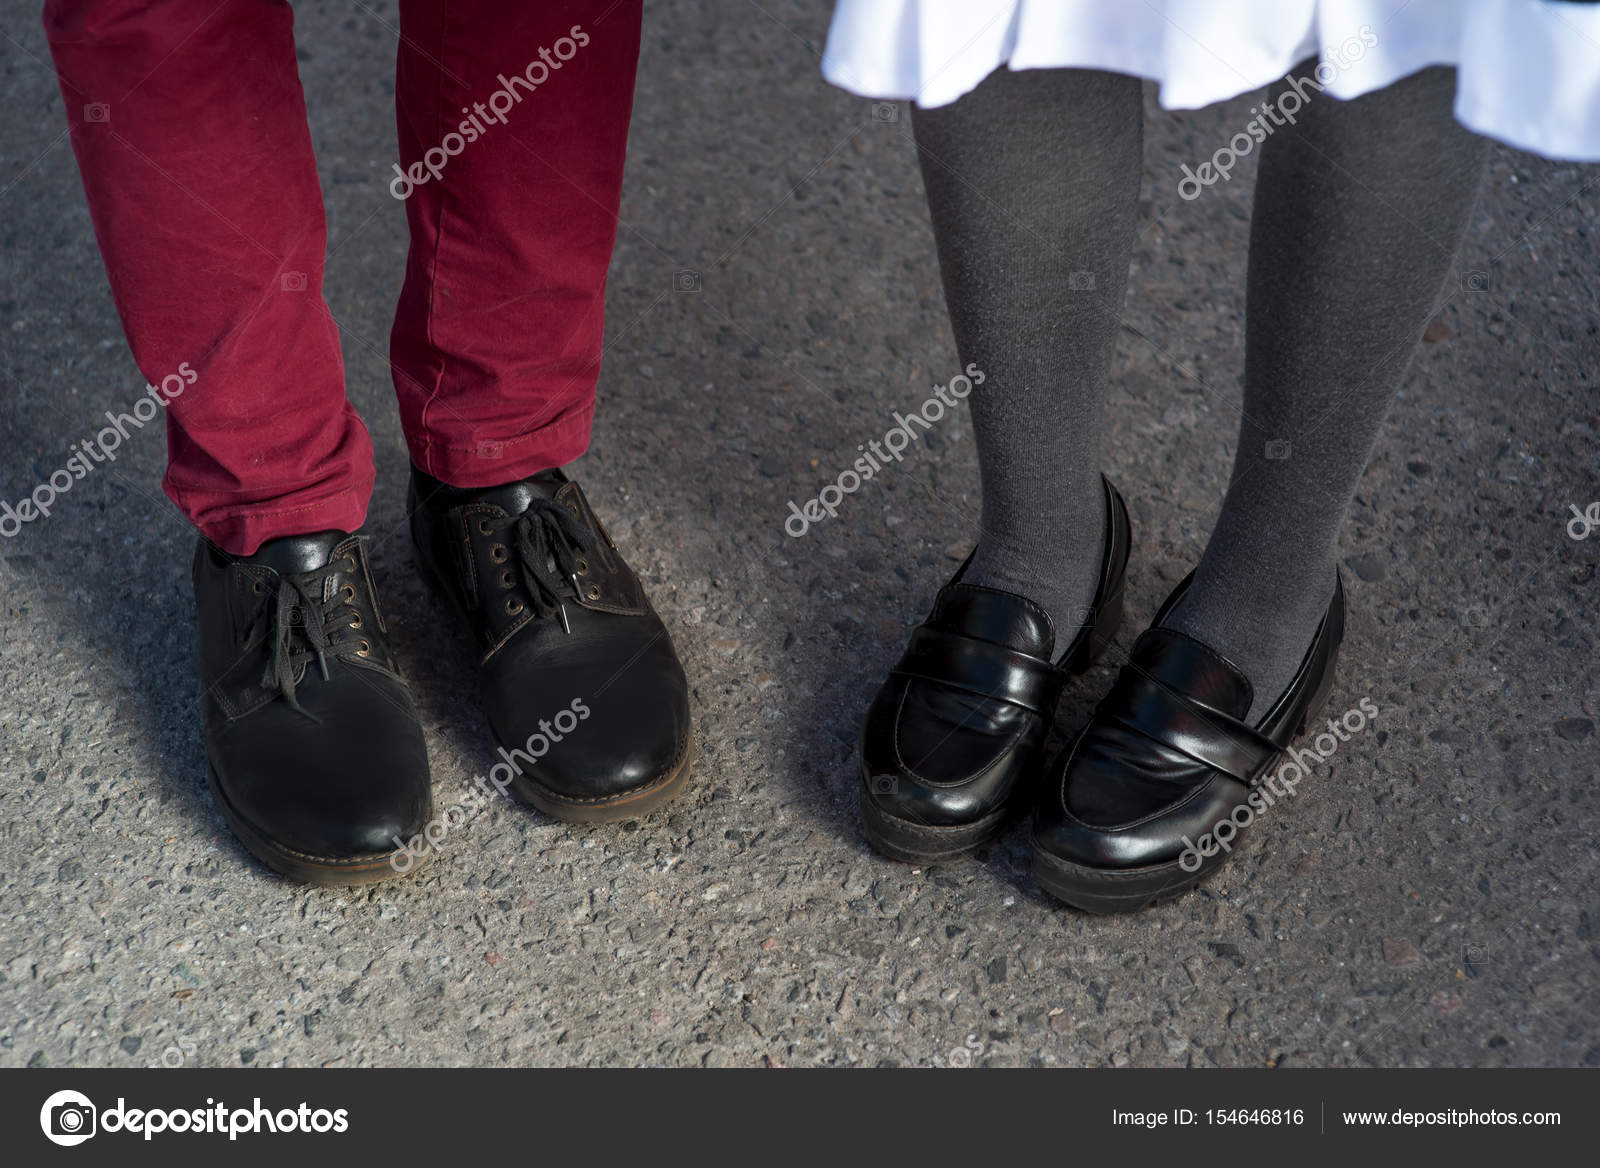 Landmädchen datieren schwarzen Kerl